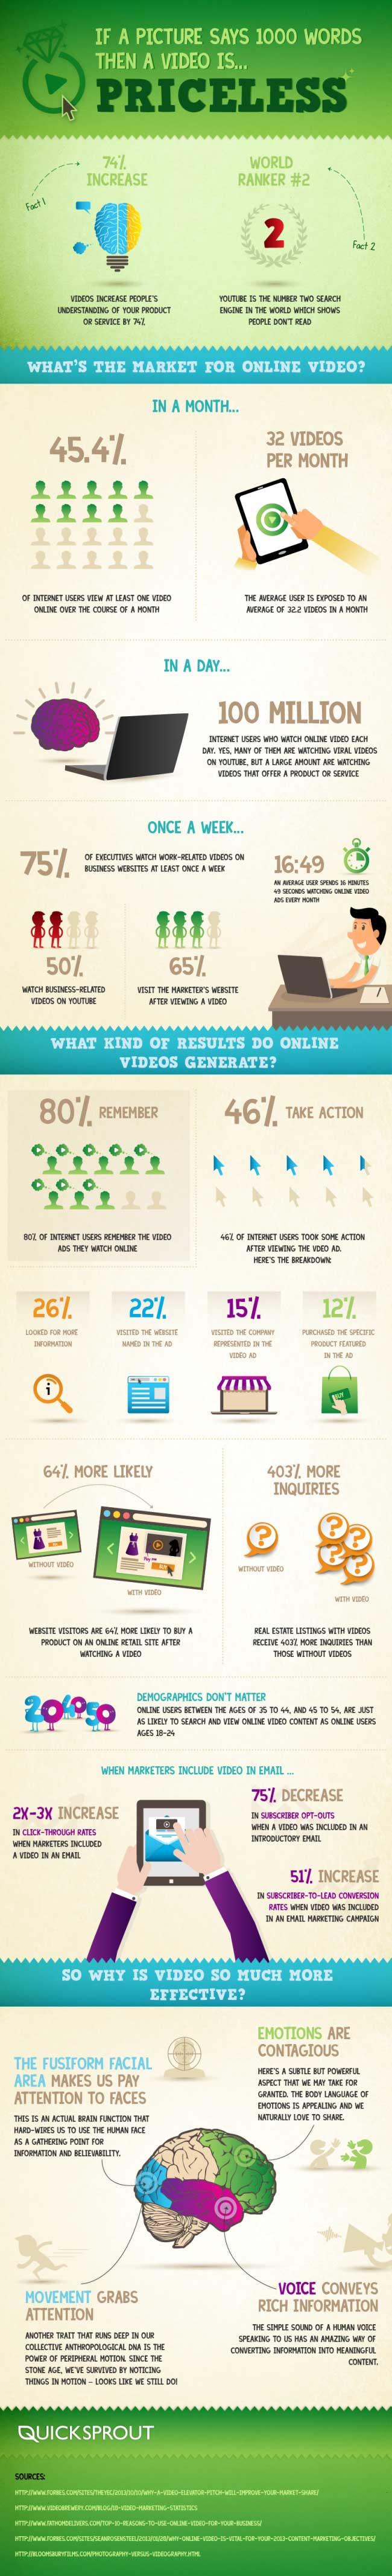 Infographie 132 - videos-social-media-part